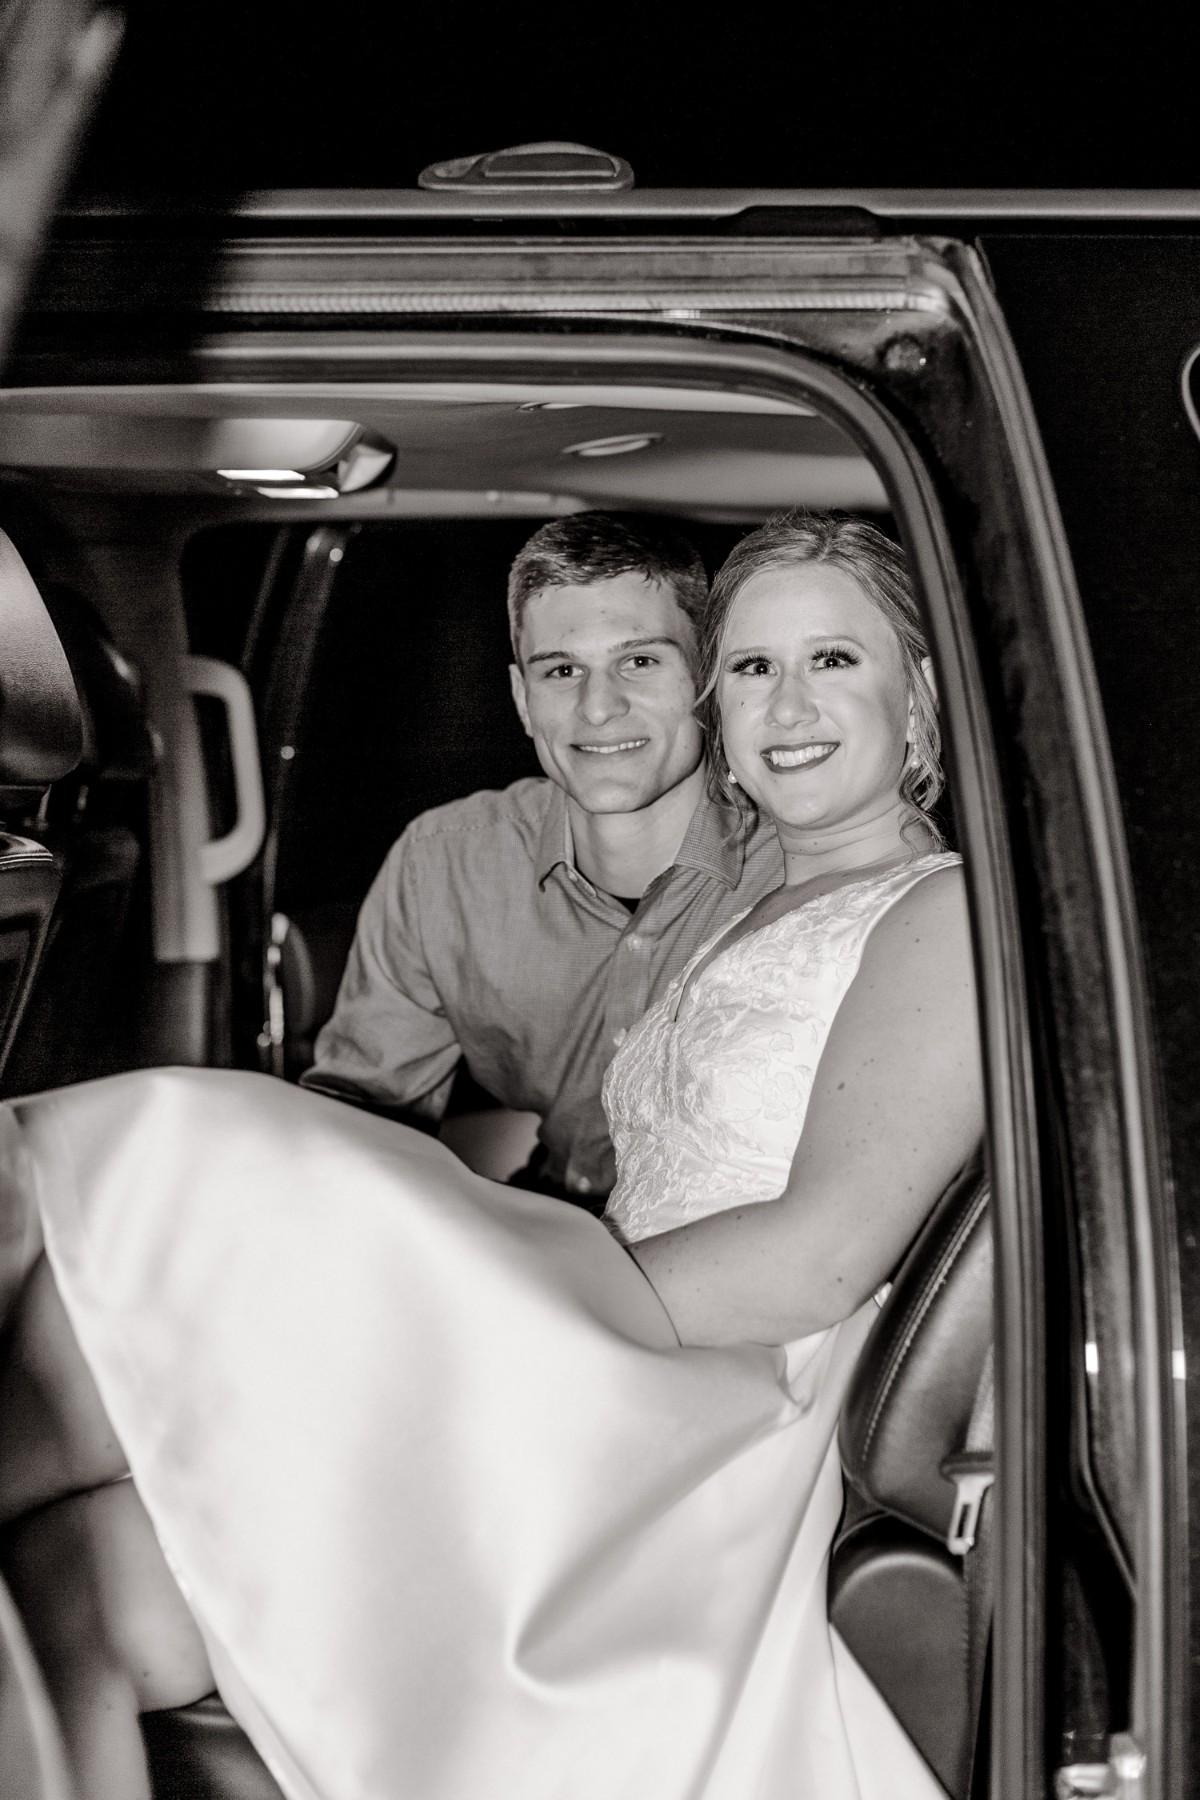 ennis-texas-wedding-photographer-kaitlyn-bullard-134.jpg